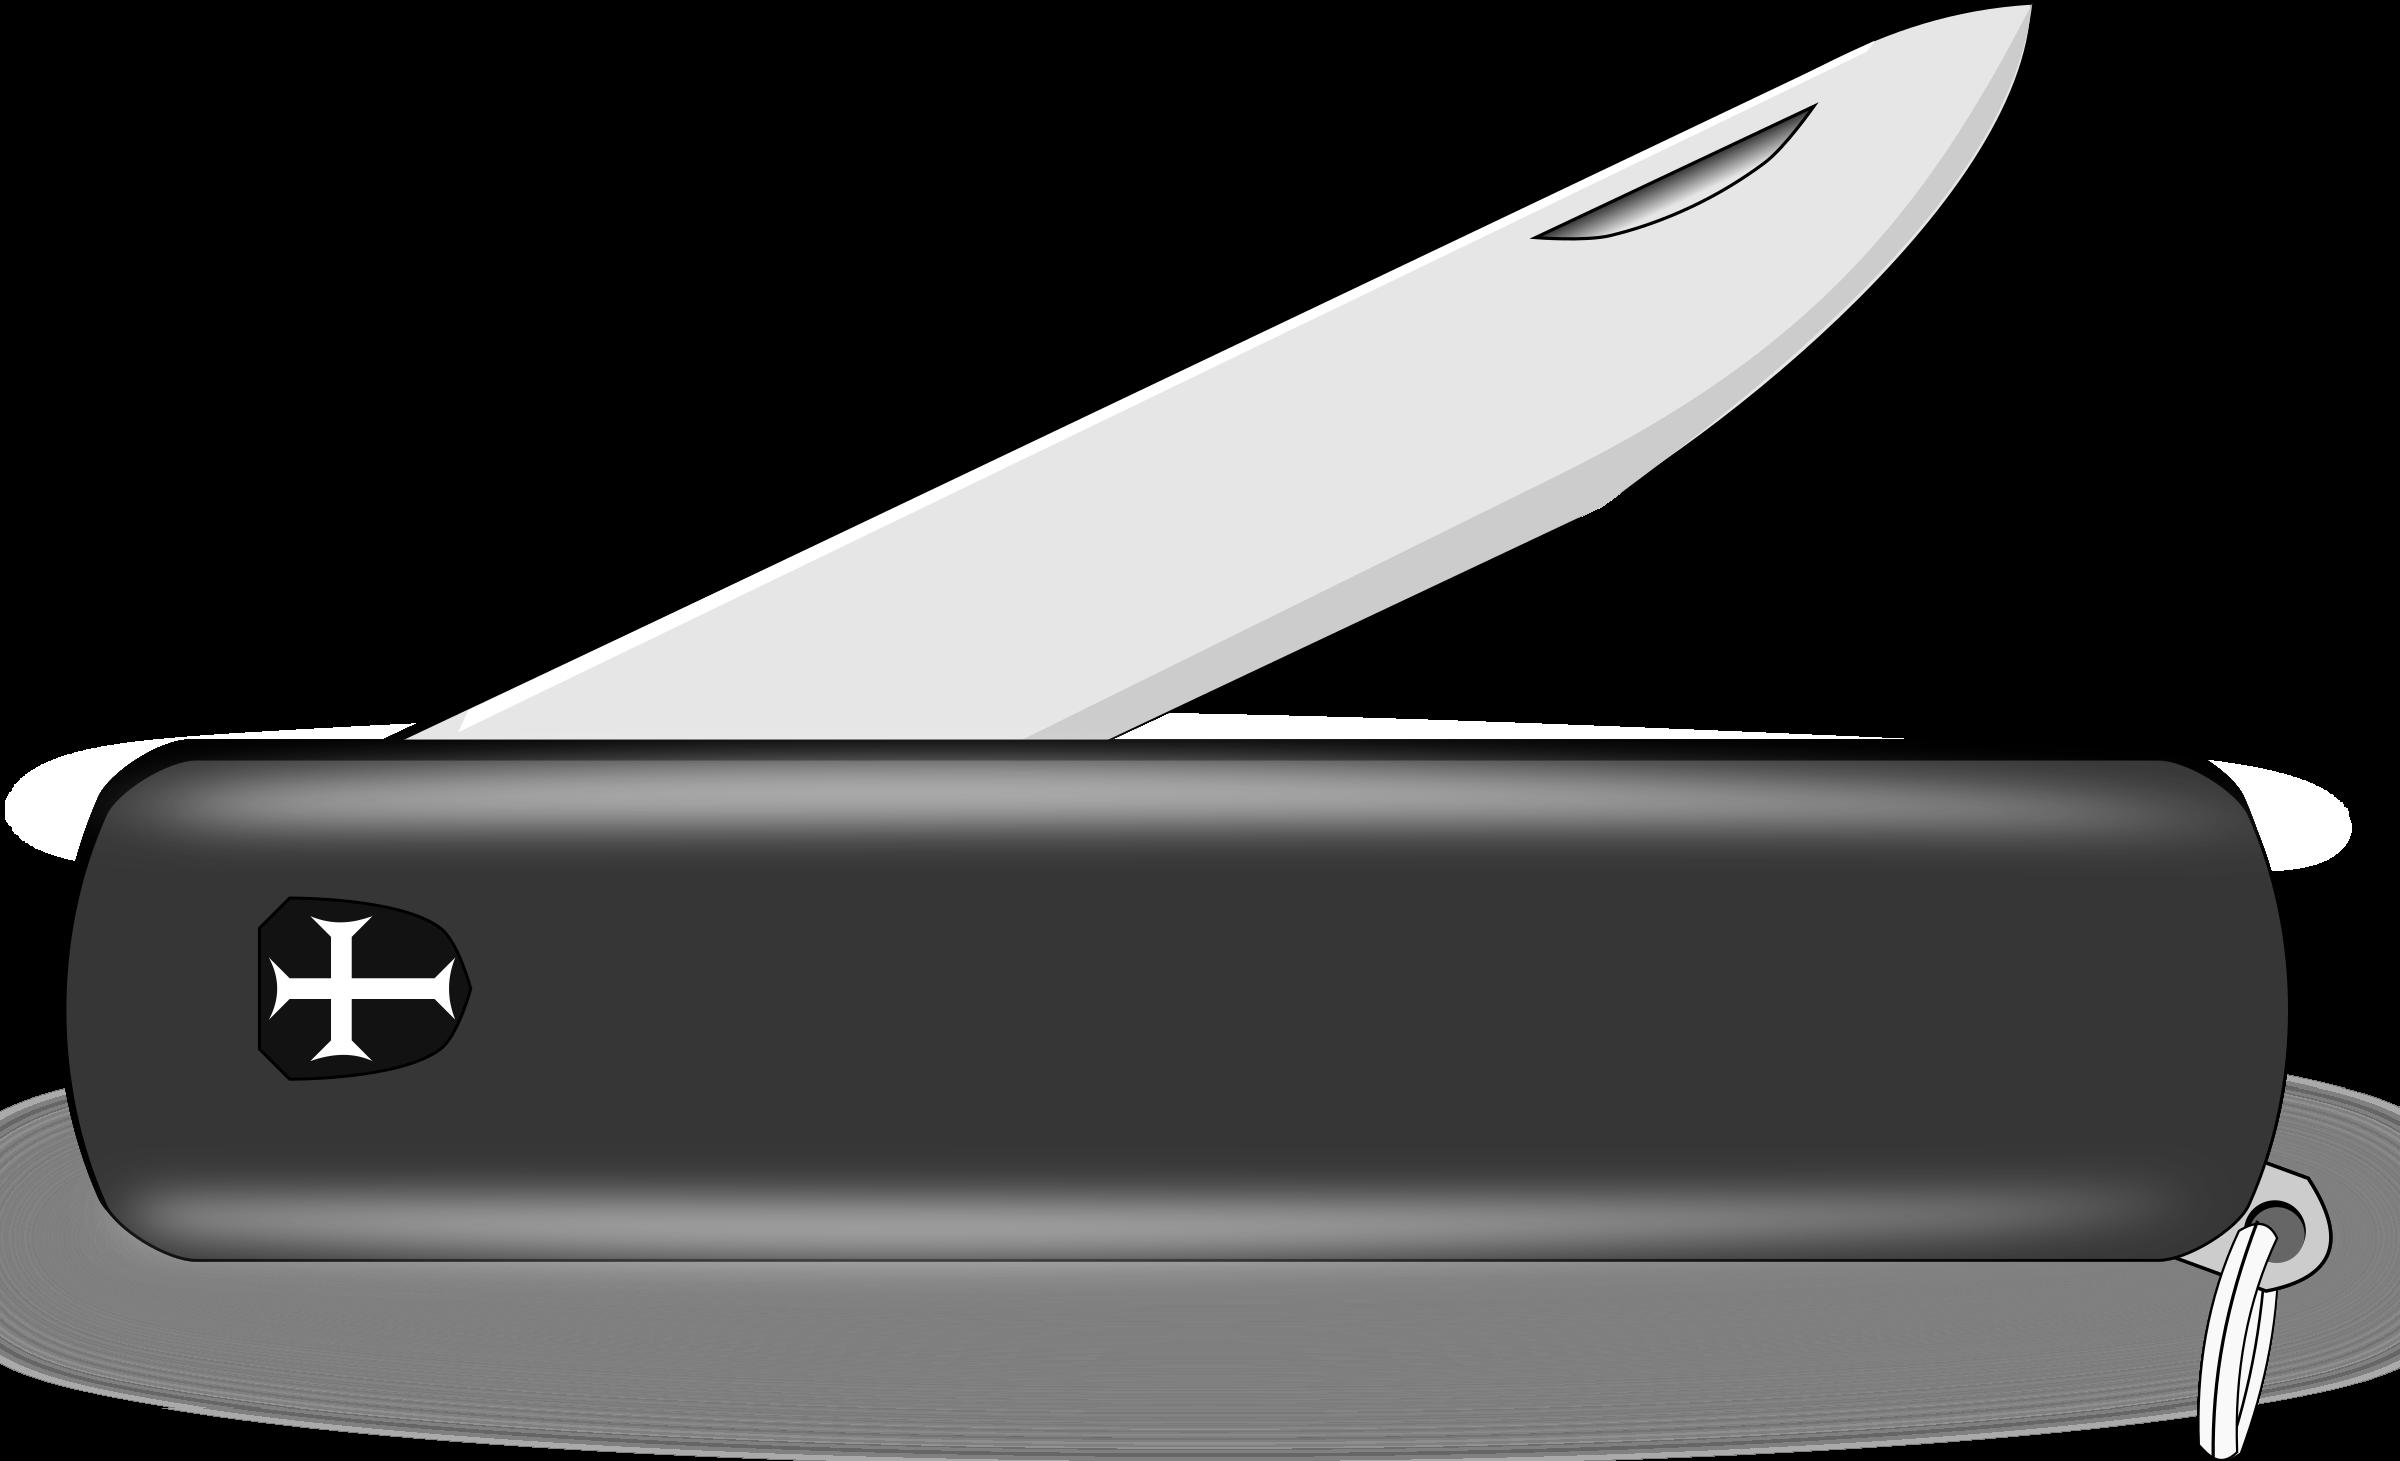 clip art royalty free download Clipartblack com tools free. Pocket knife clipart